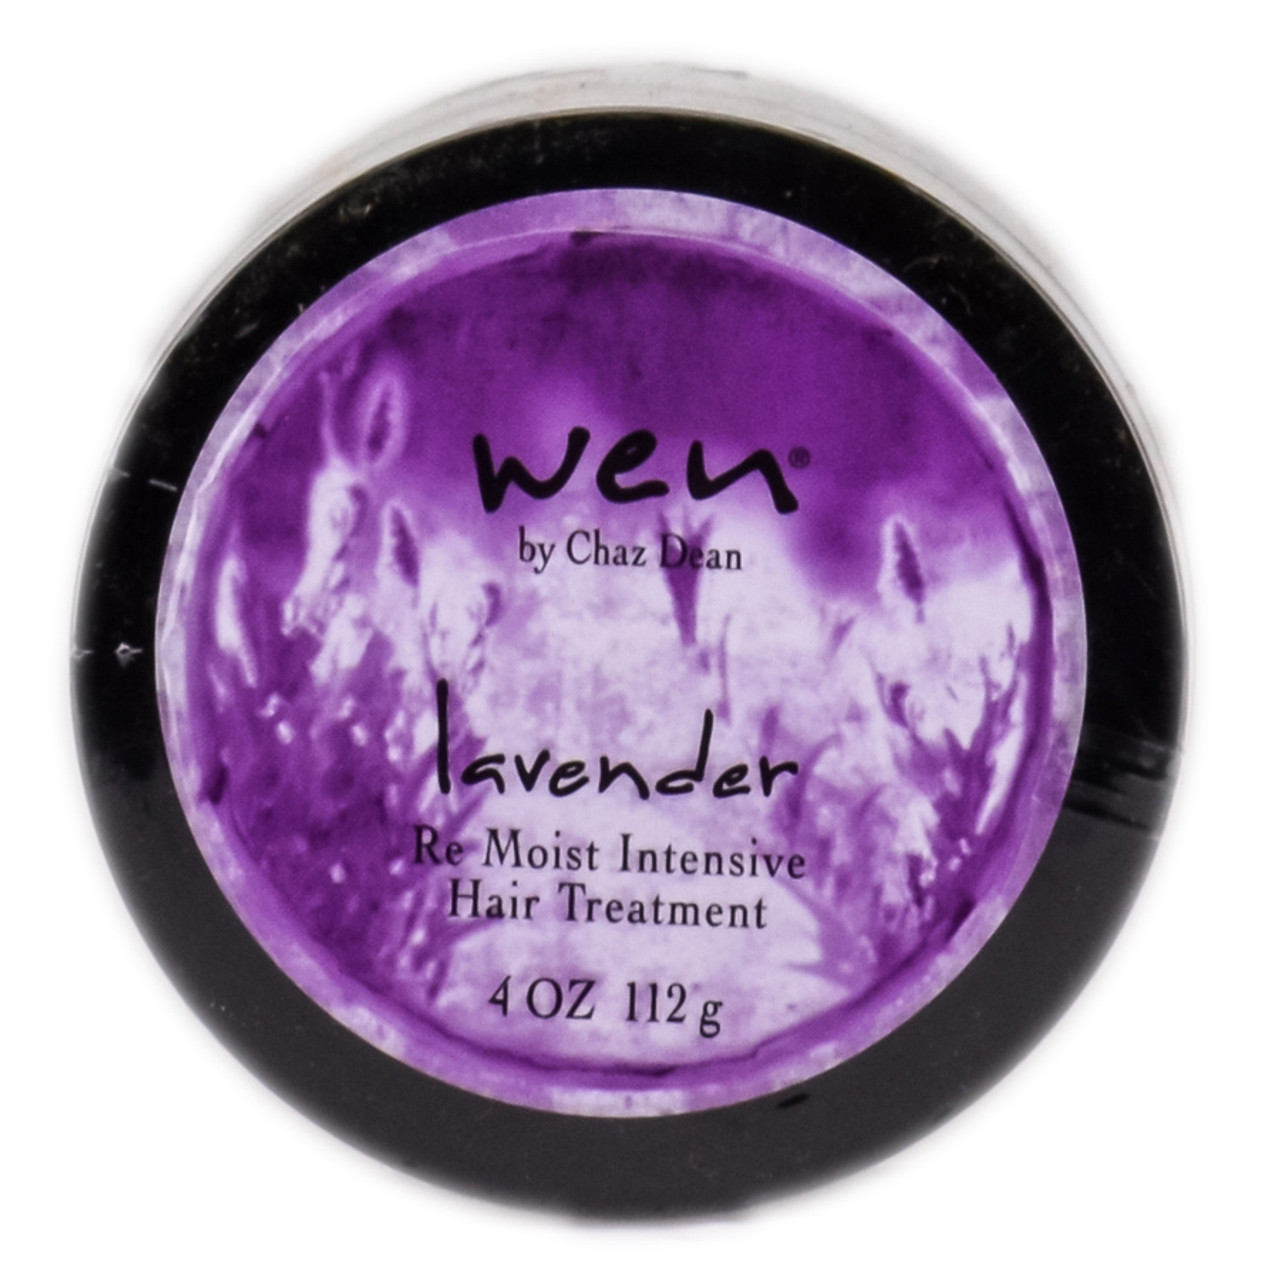 Wen Lavender Re Moist Intensive Hair Treatment Sleekshop